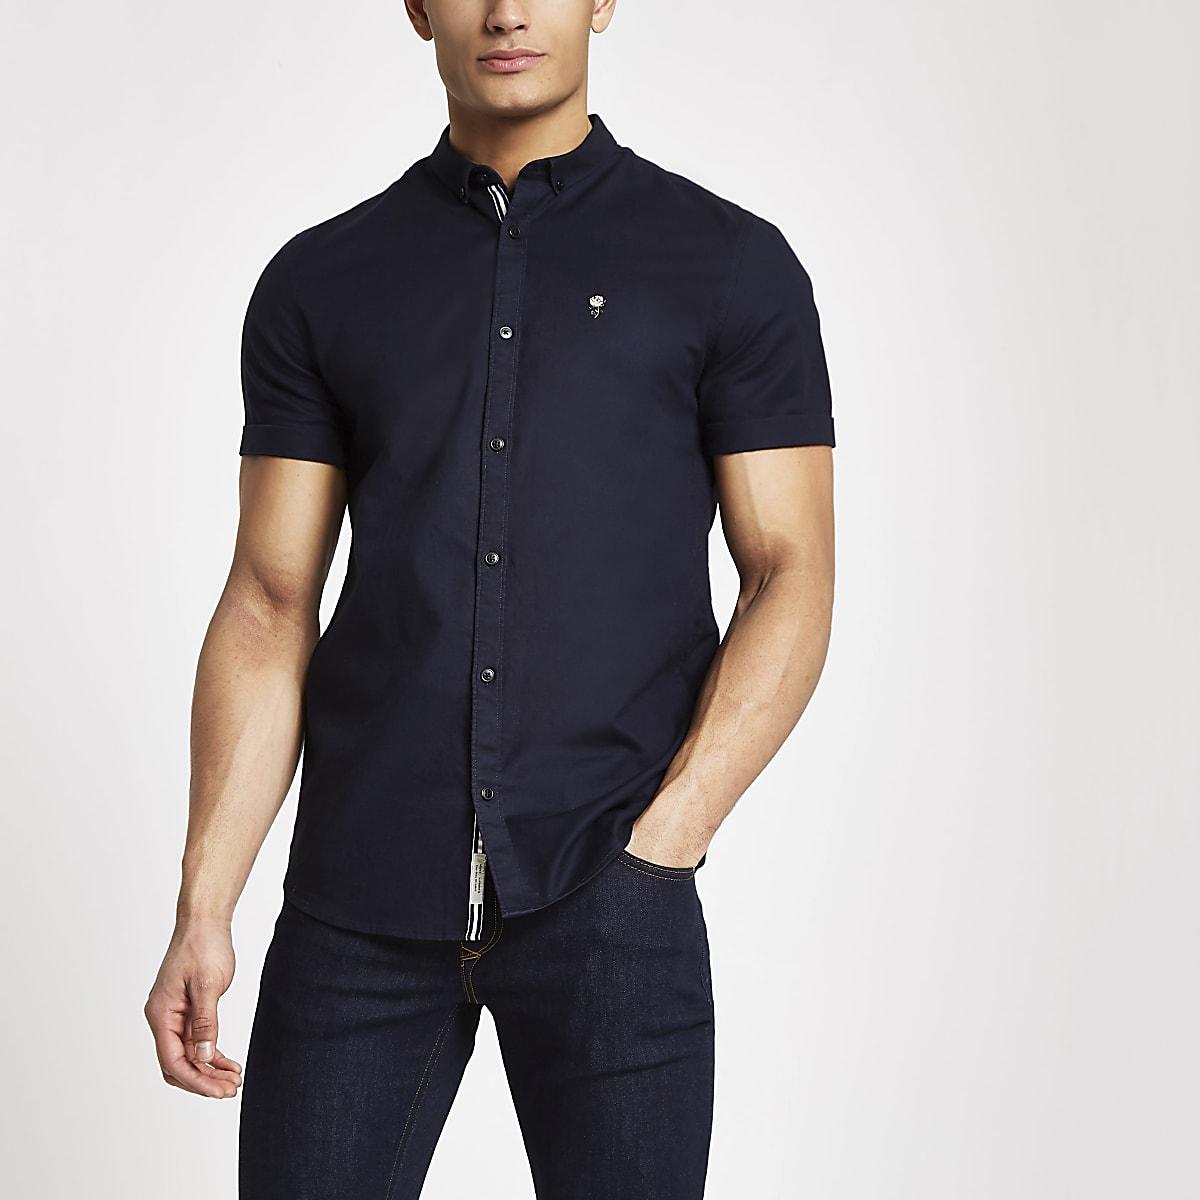 Navy Oxford short sleeve shirt